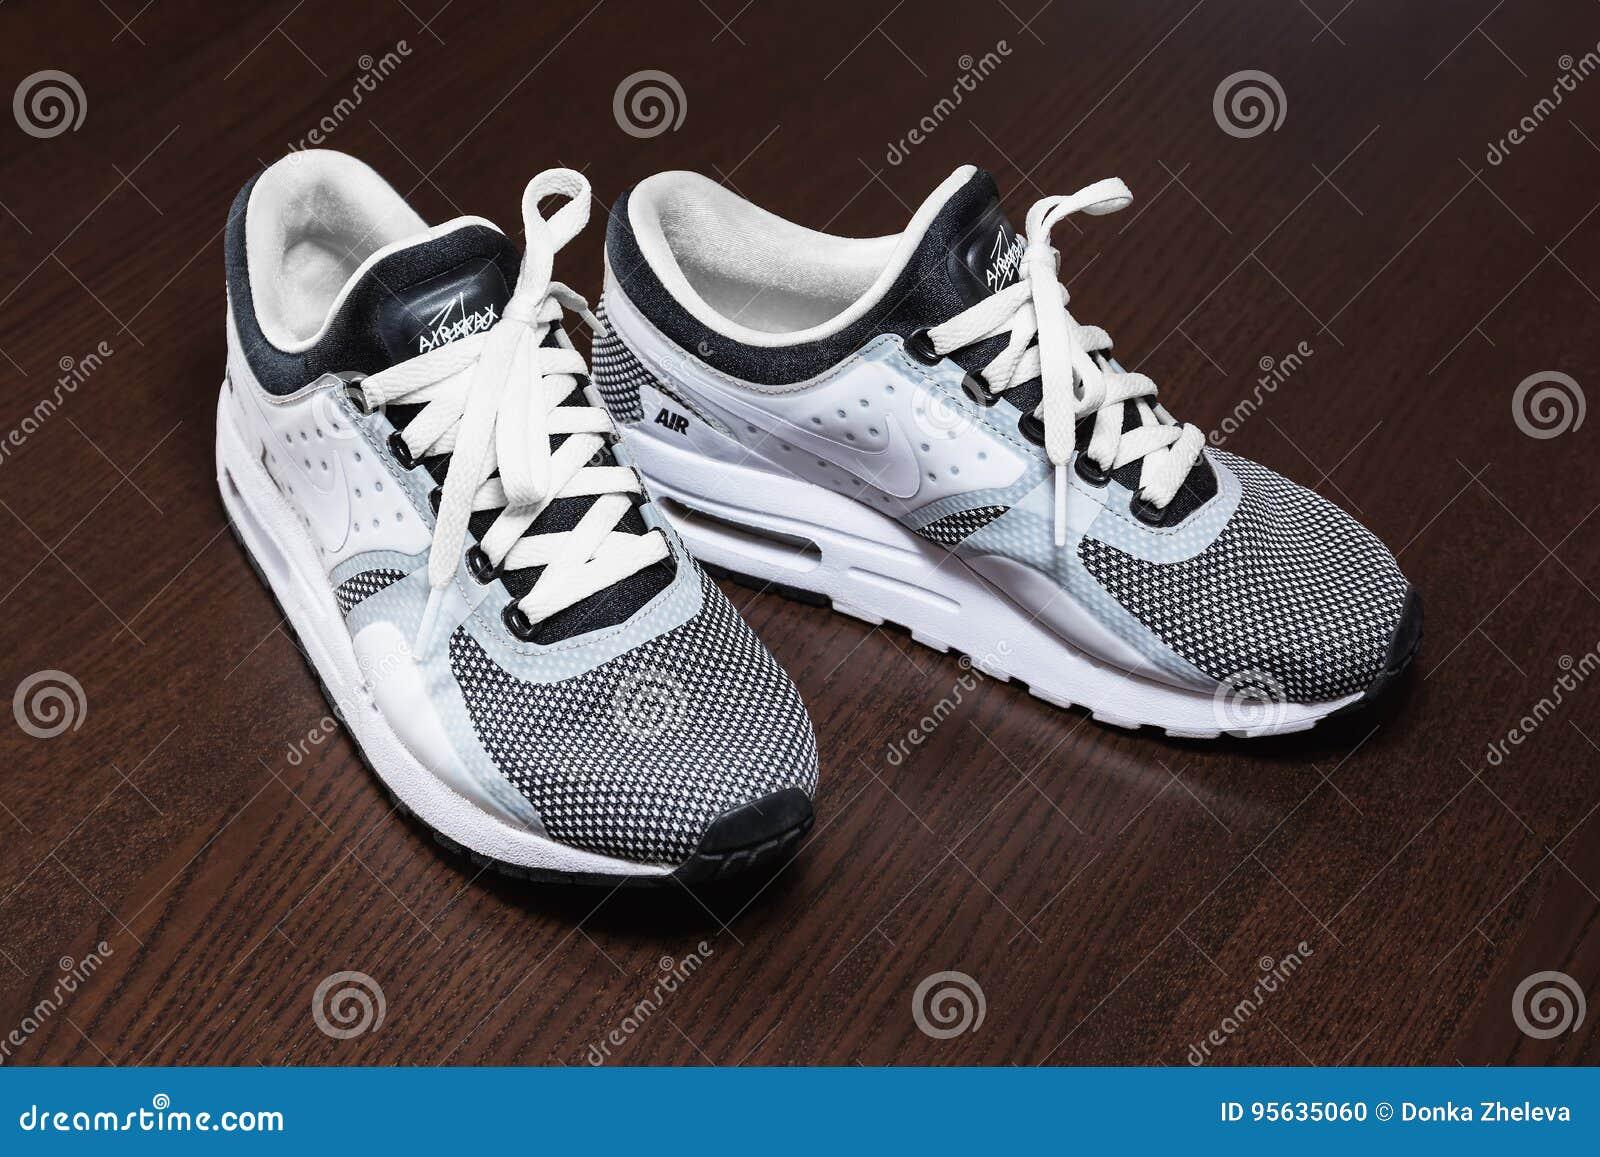 cheap for discount c8d25 36a20 SOFIA, BULGARIJE - JULI 1, 2017 De schoenen van Nike Air MAX Zero  Essential - tennisschoenen - trainers in zwart-wit op houten achtergrond  Nike is globale ...